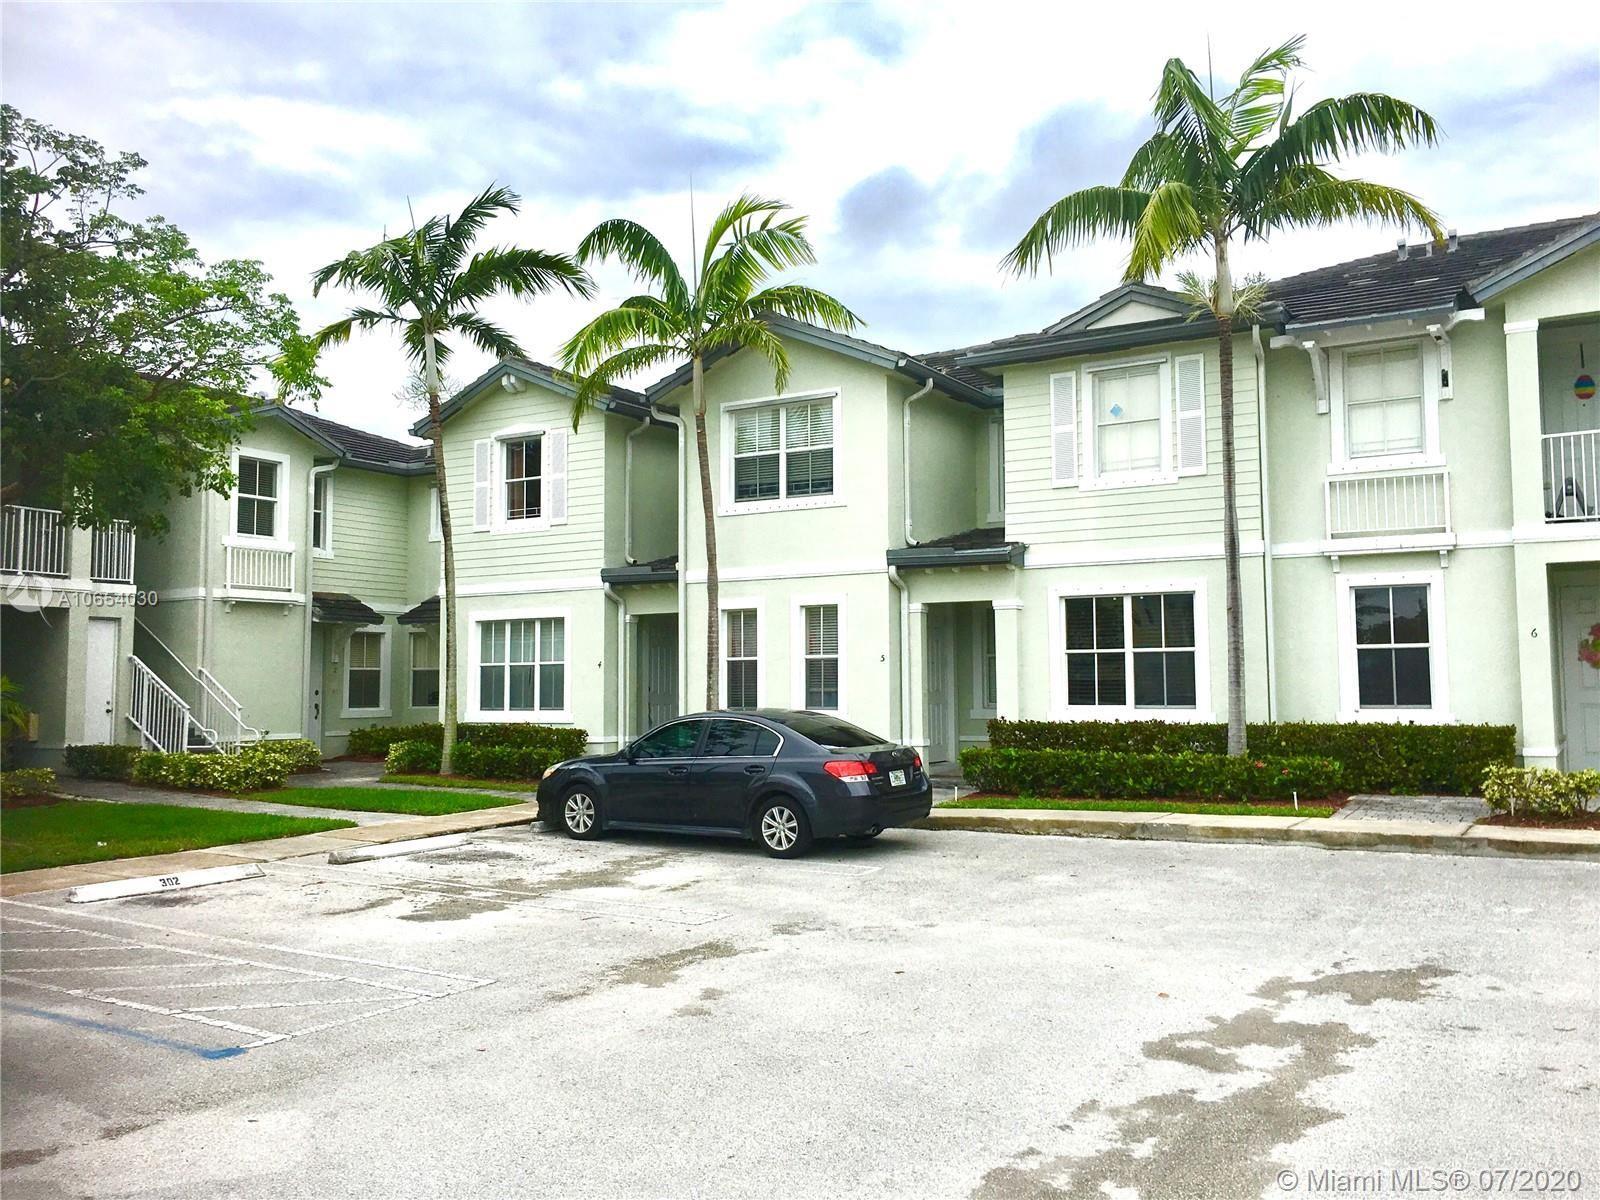 208 SE 29th Ave #4, Homestead, FL 33033 - MLS#: A10654030